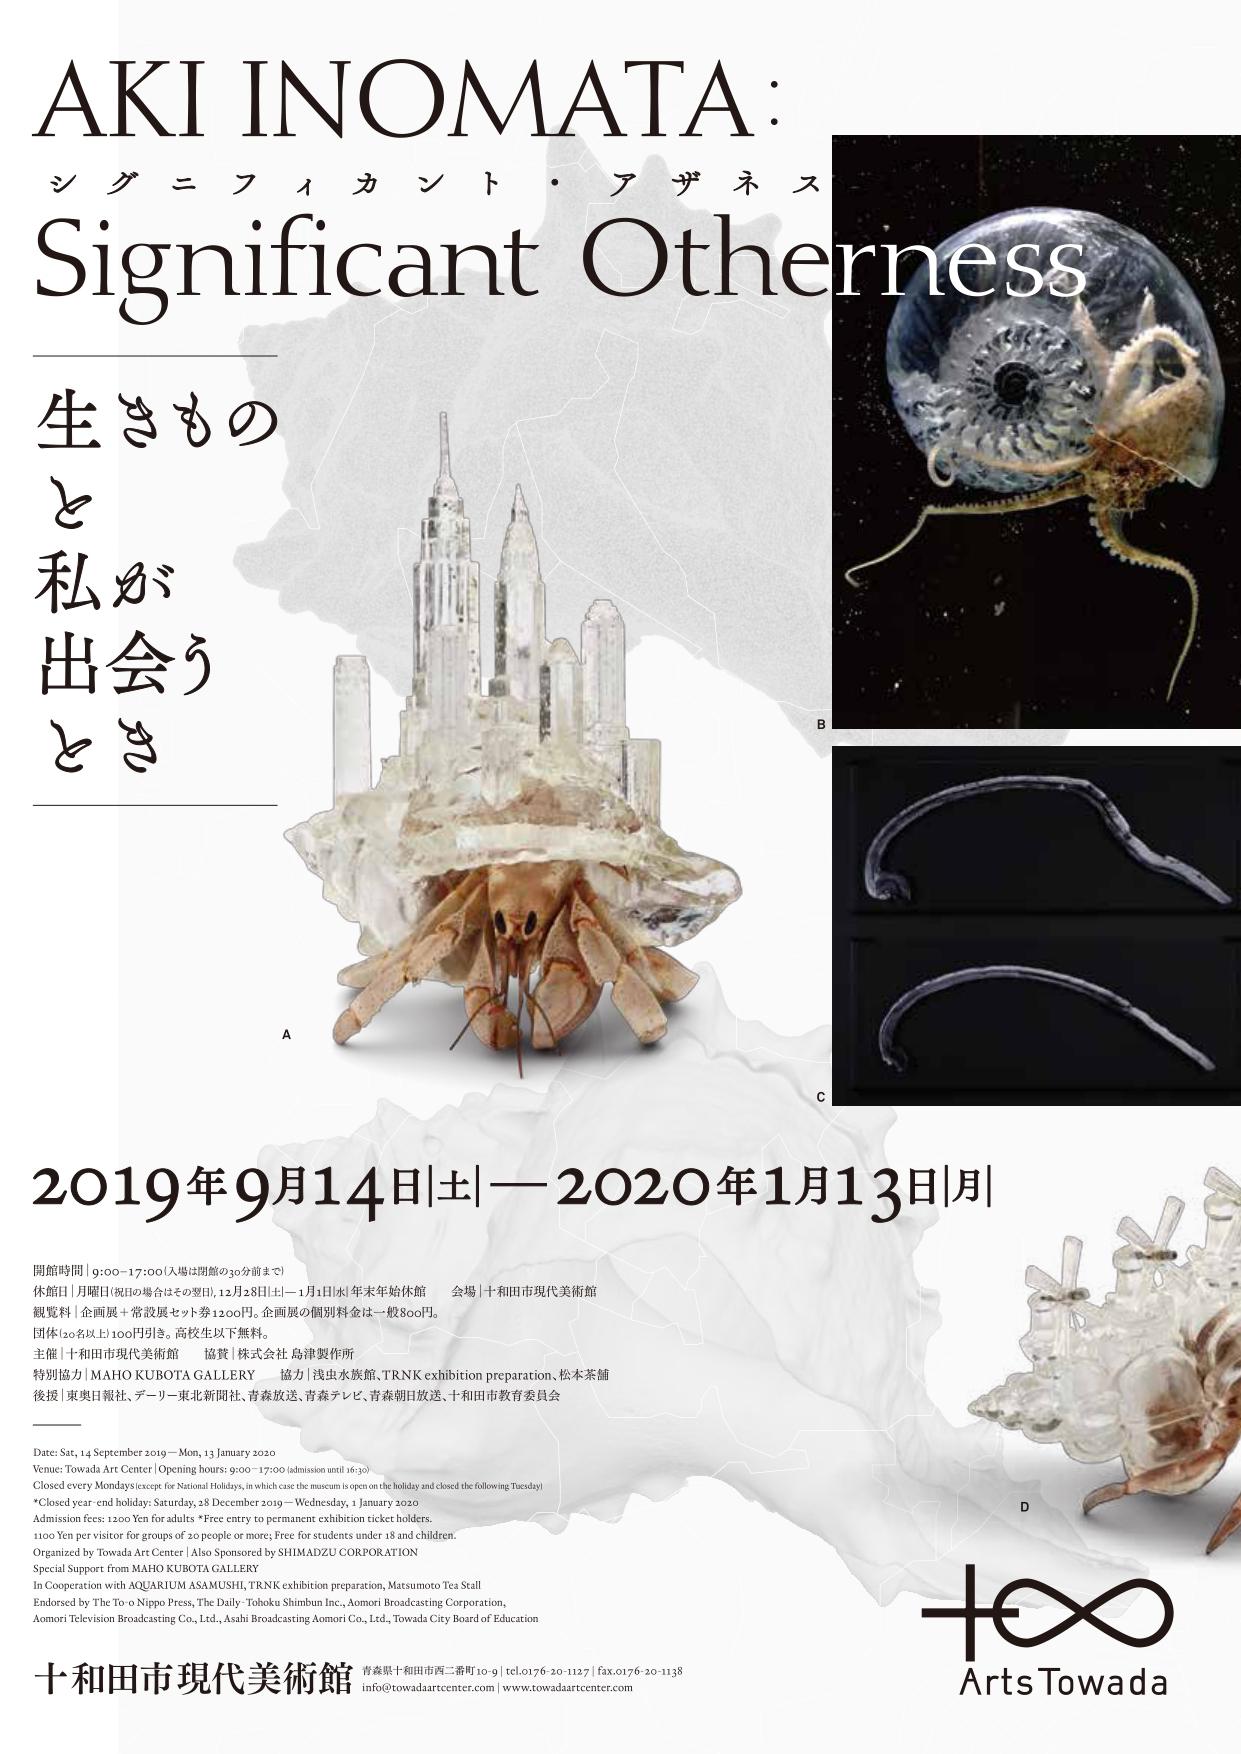 Exhibition: 十和田市現代美術館「AKI INOMATA: Significant Otherness 生きものと私が出会うとき」